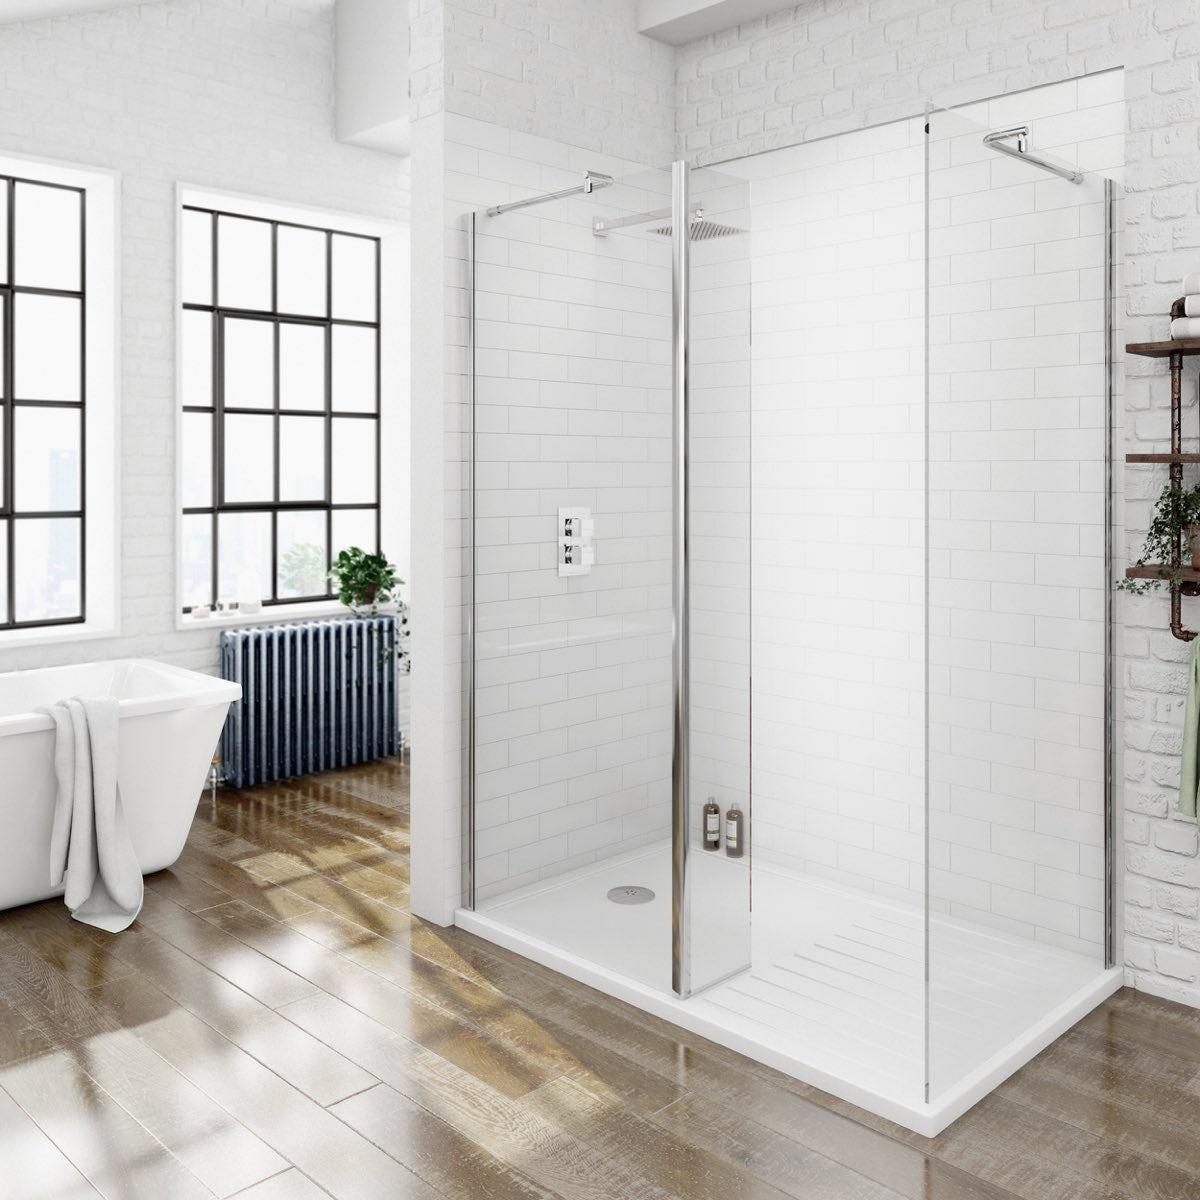 Free delivery V8  Walk in Shower Enclosure Pack 1400 x 900. Mode luxury 8mm walk in enclosure pack with tray 1400 x 900